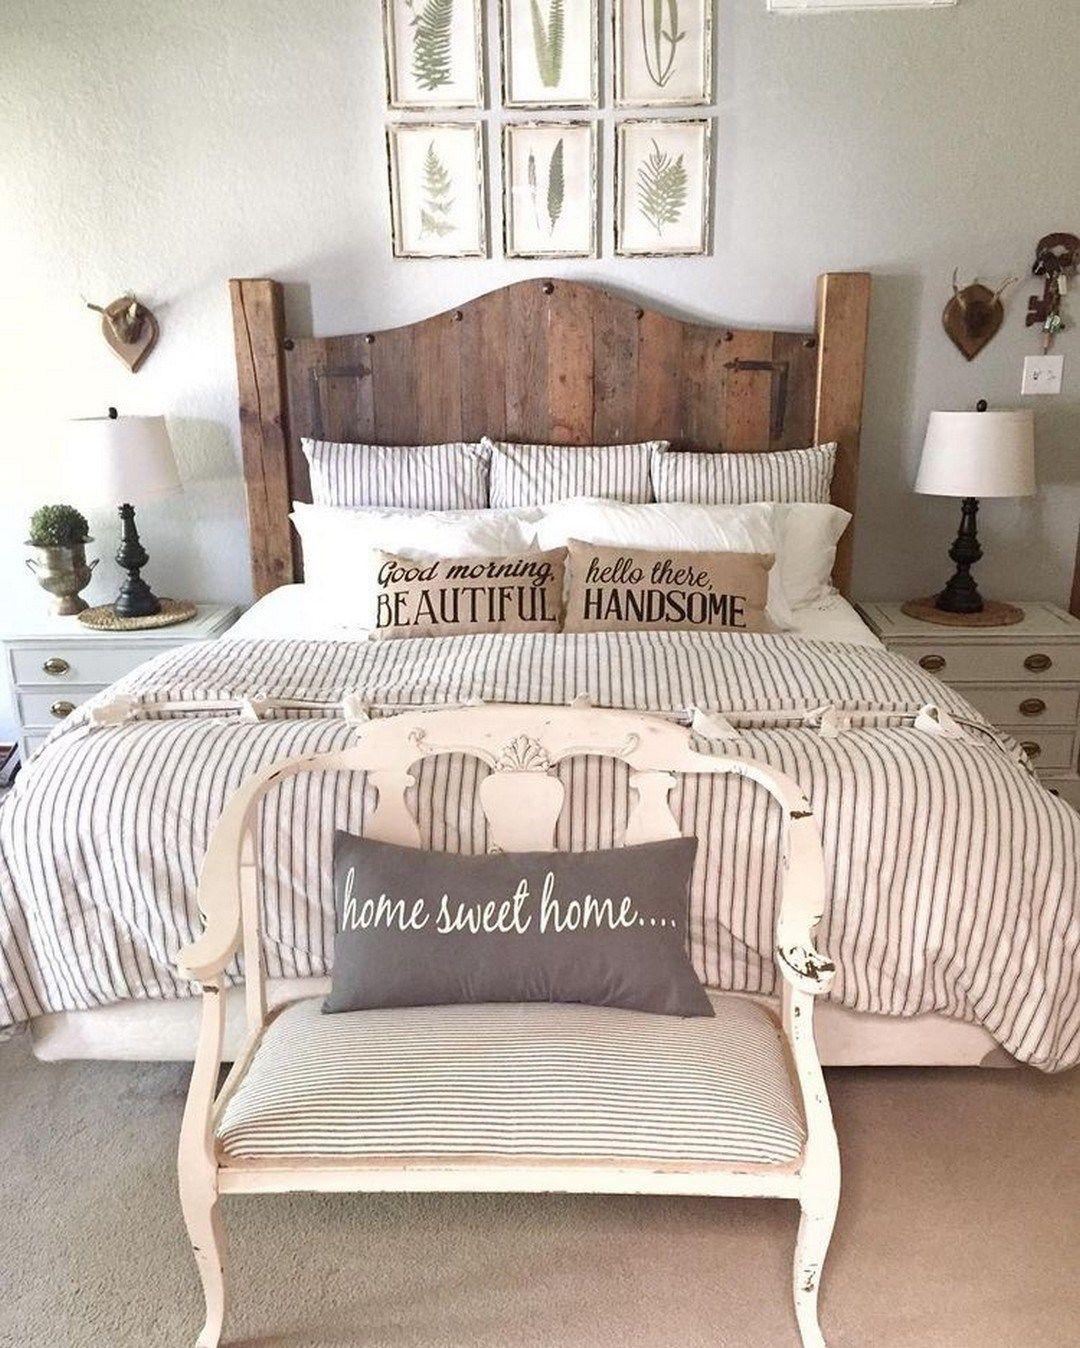 40 Guest Bedroom Ideas: Rustic Farmhouse Bedroom Decorating Ideas To Transform